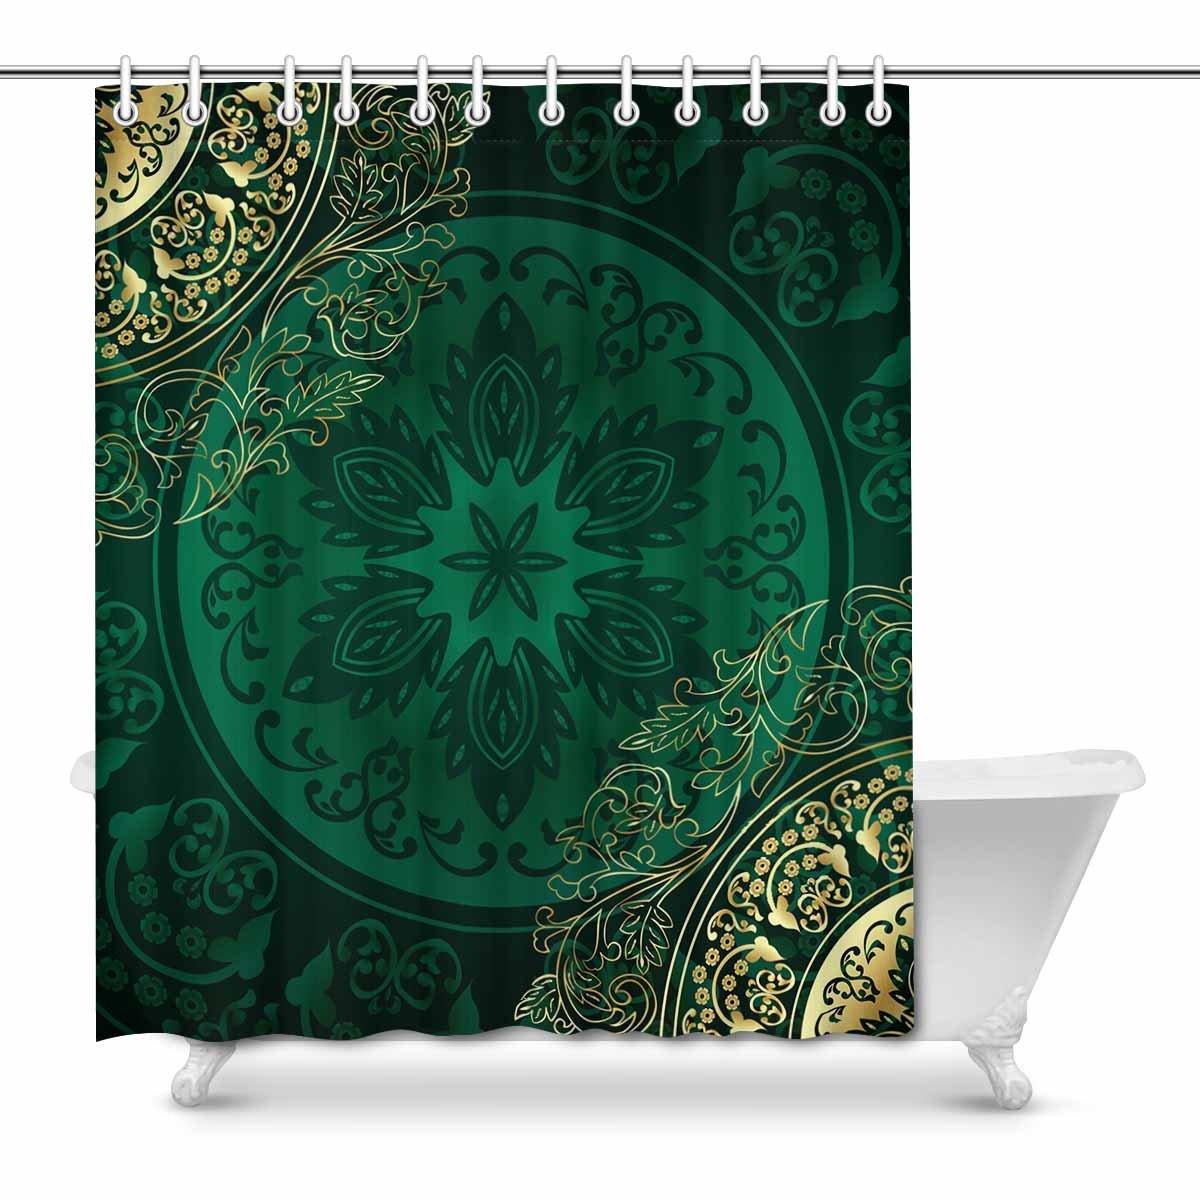 Mkhert Gold Green Mandala Floral Swirls Antique Eastern Arab Pattern House Decor Shower Curtain For Bathroom Decorative Fabric Bath Curtain Set 66x72